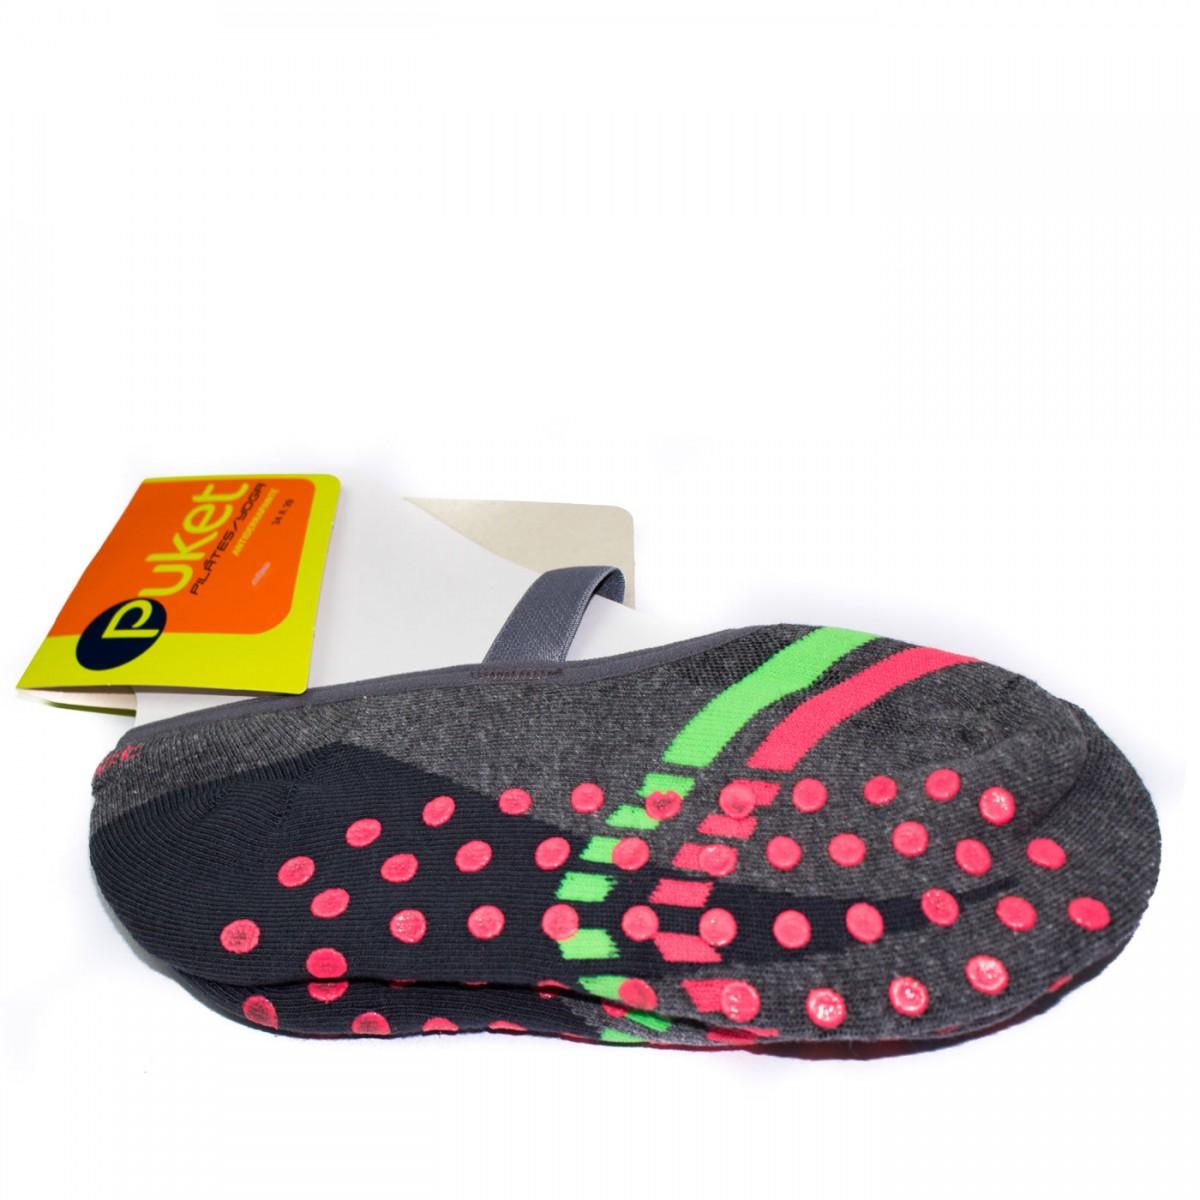 f4e3ac978 Bizz Store - Meia Para Pilates Puket Feminina Sapatilha